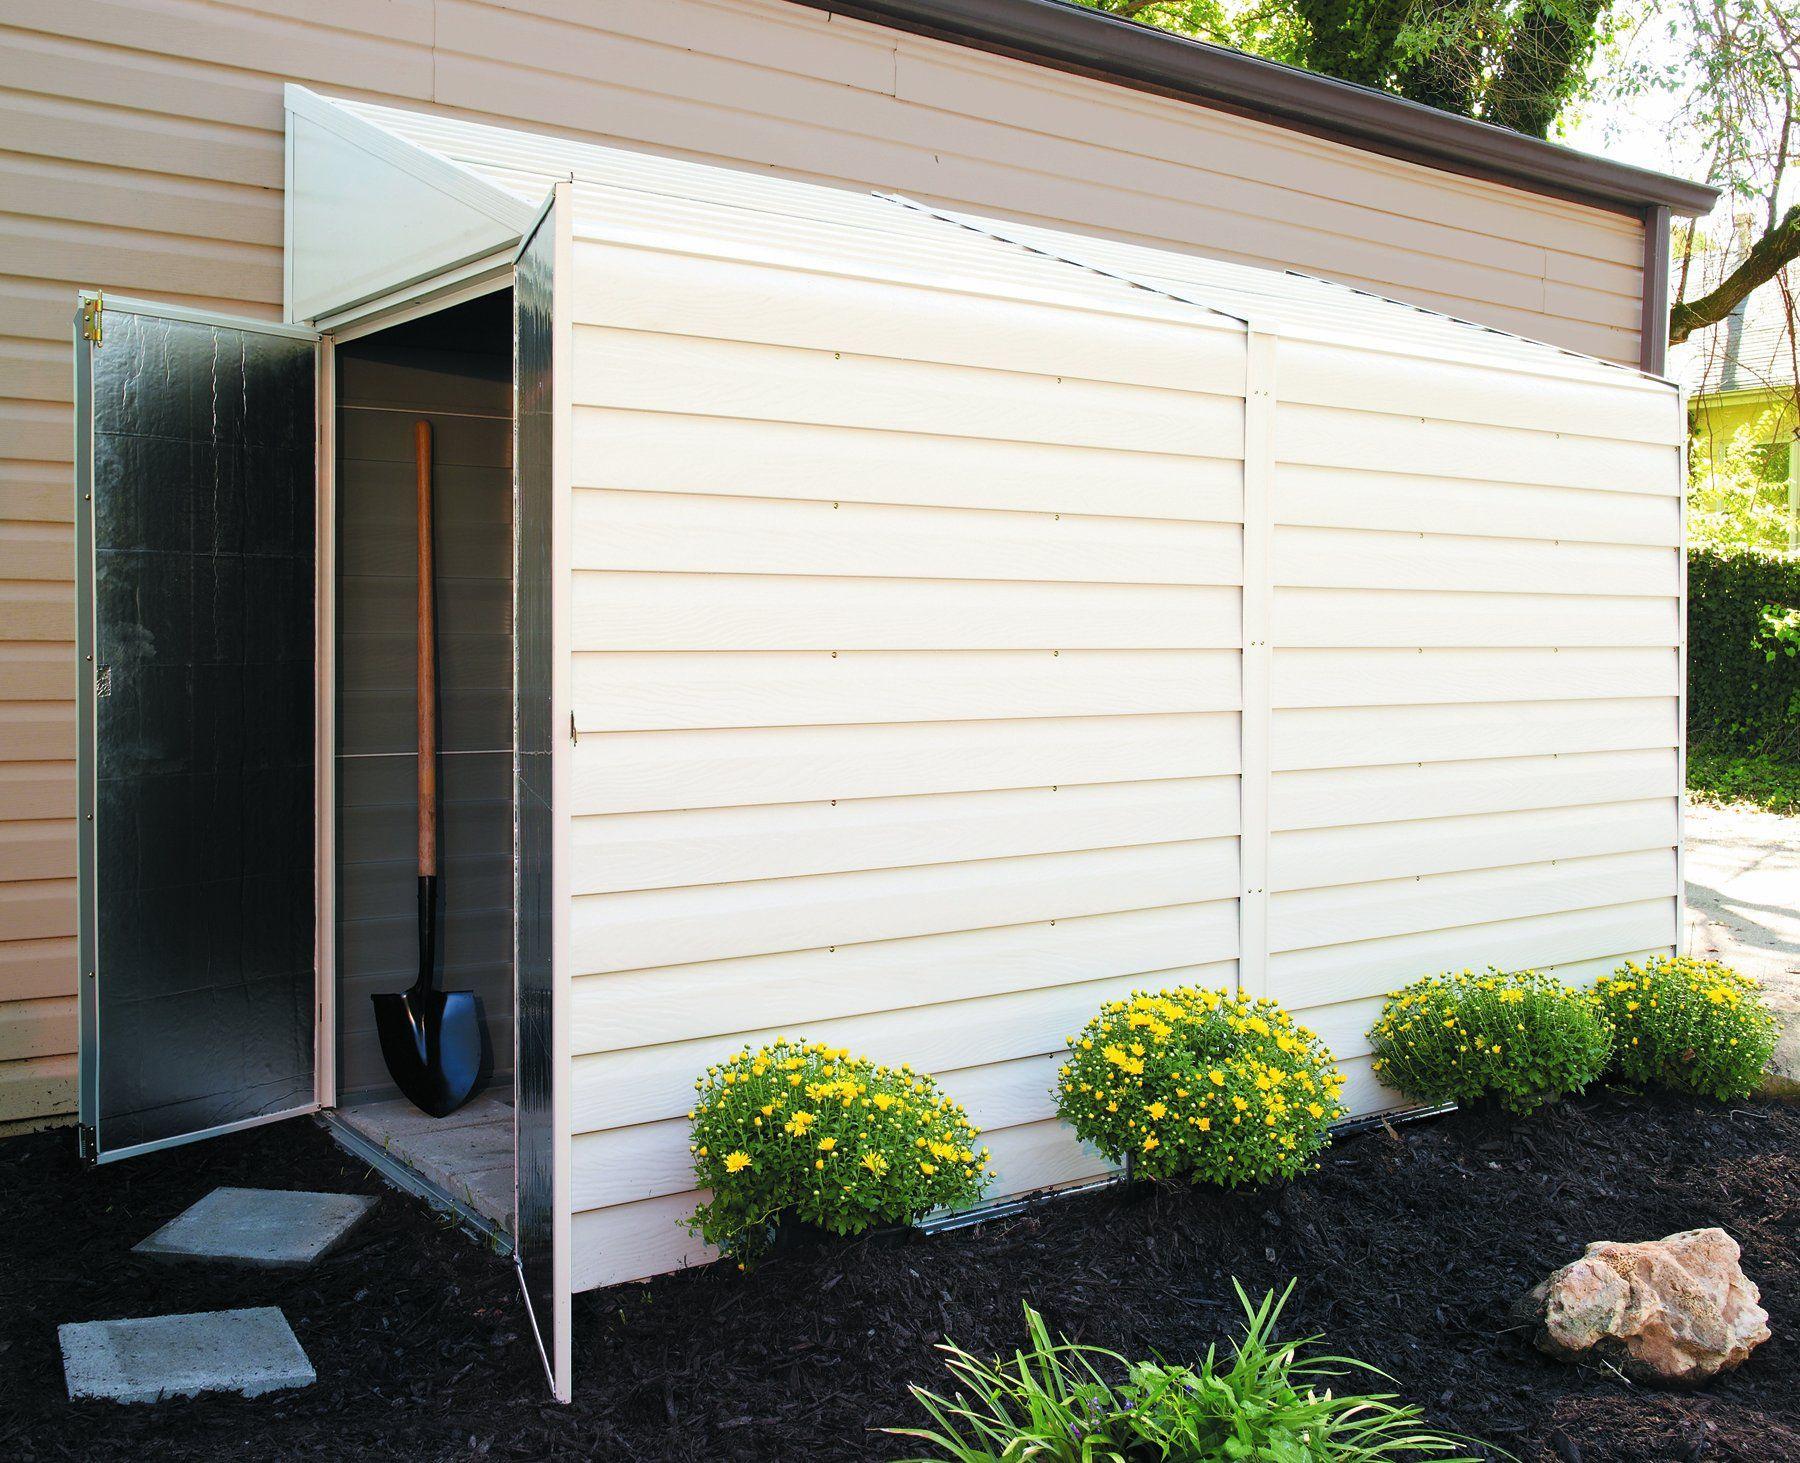 Cargo bike storage arrow shed ys410 a yard saver 4 feet by